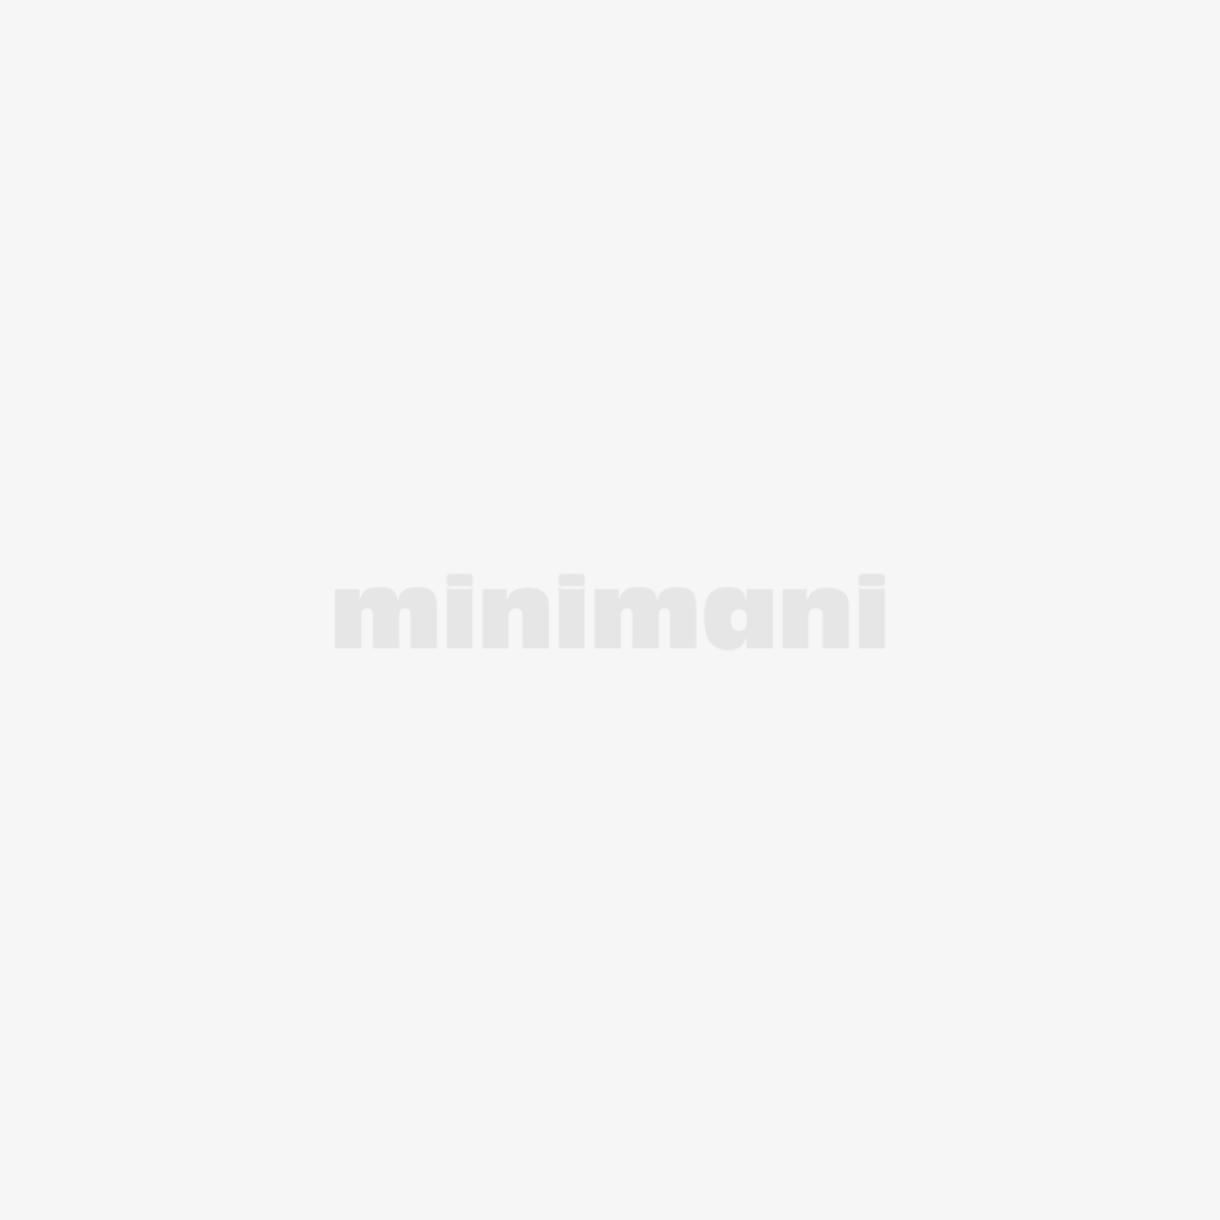 LM 520 ROSKASANKO 11,5 L, VALKOINEN